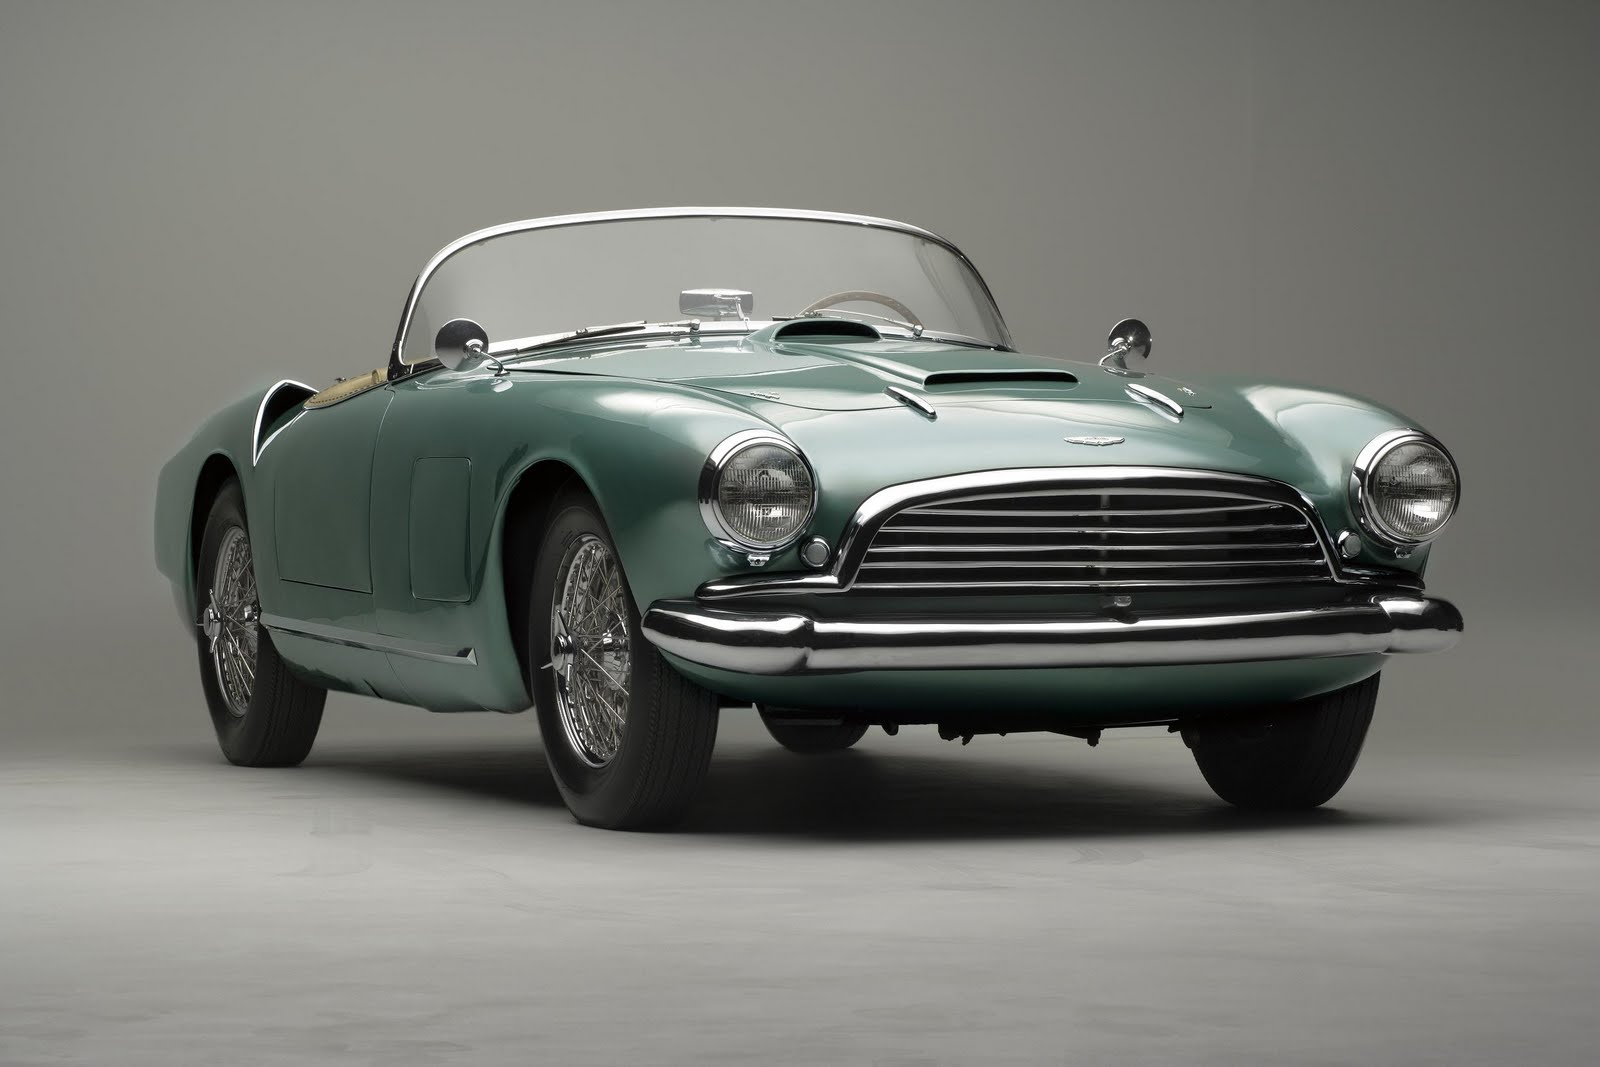 Aston Martin Vantage Alquiler - micochedelujocom